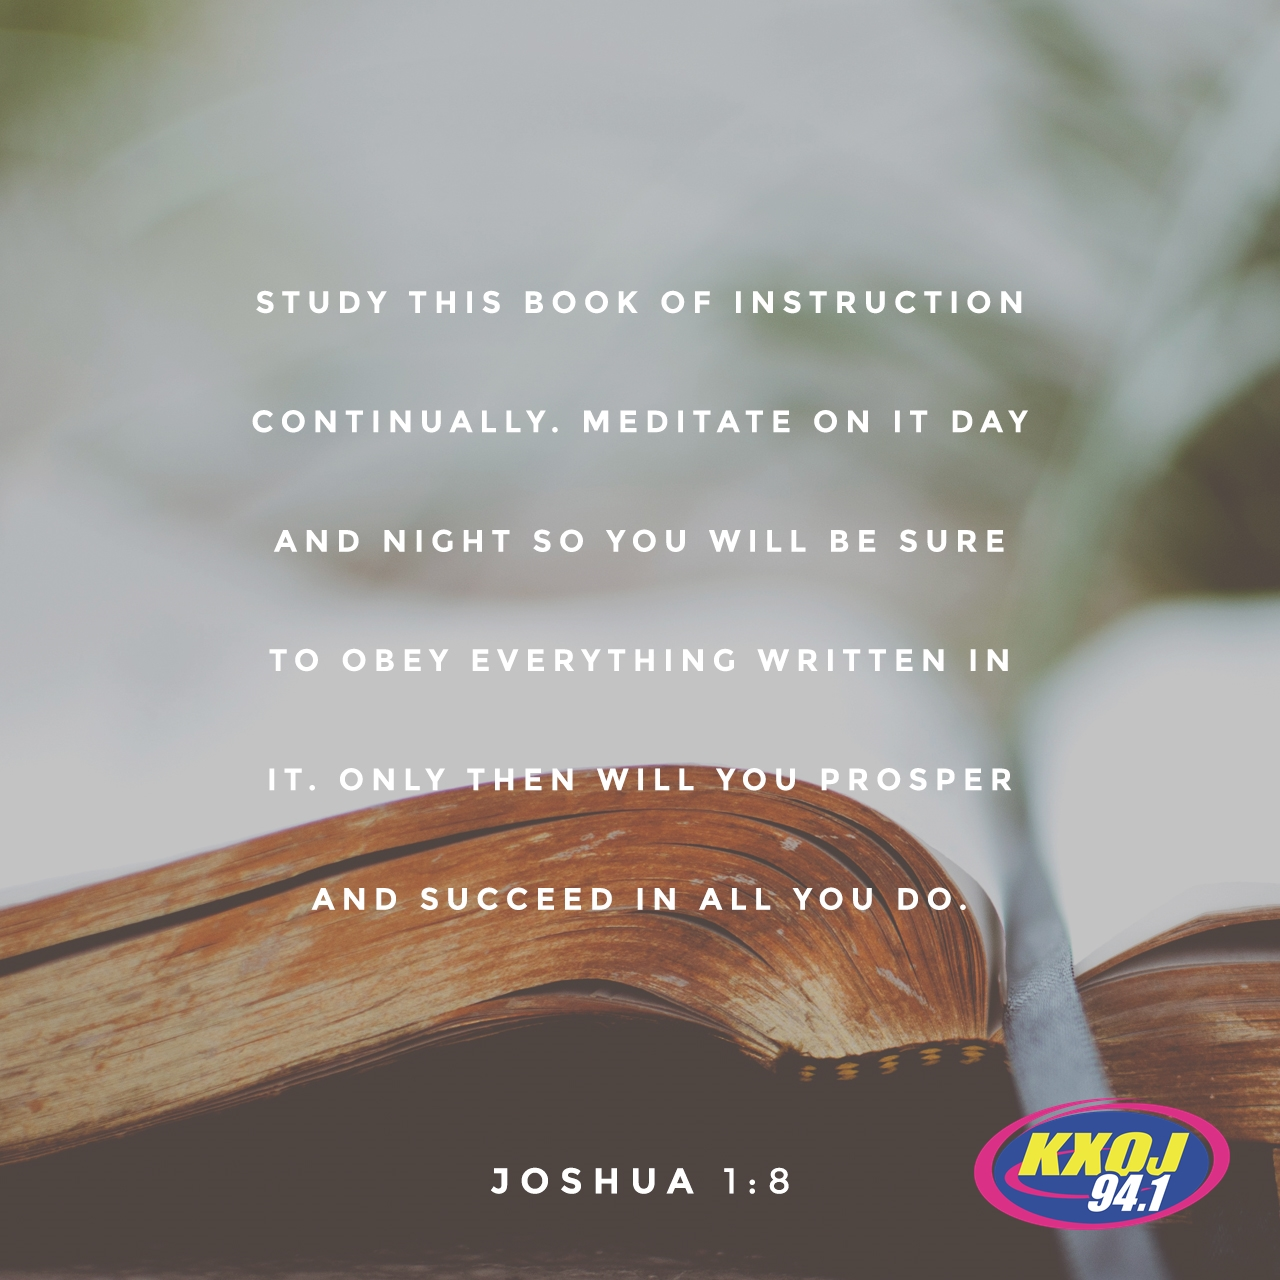 August 8th - Joshua 1:8